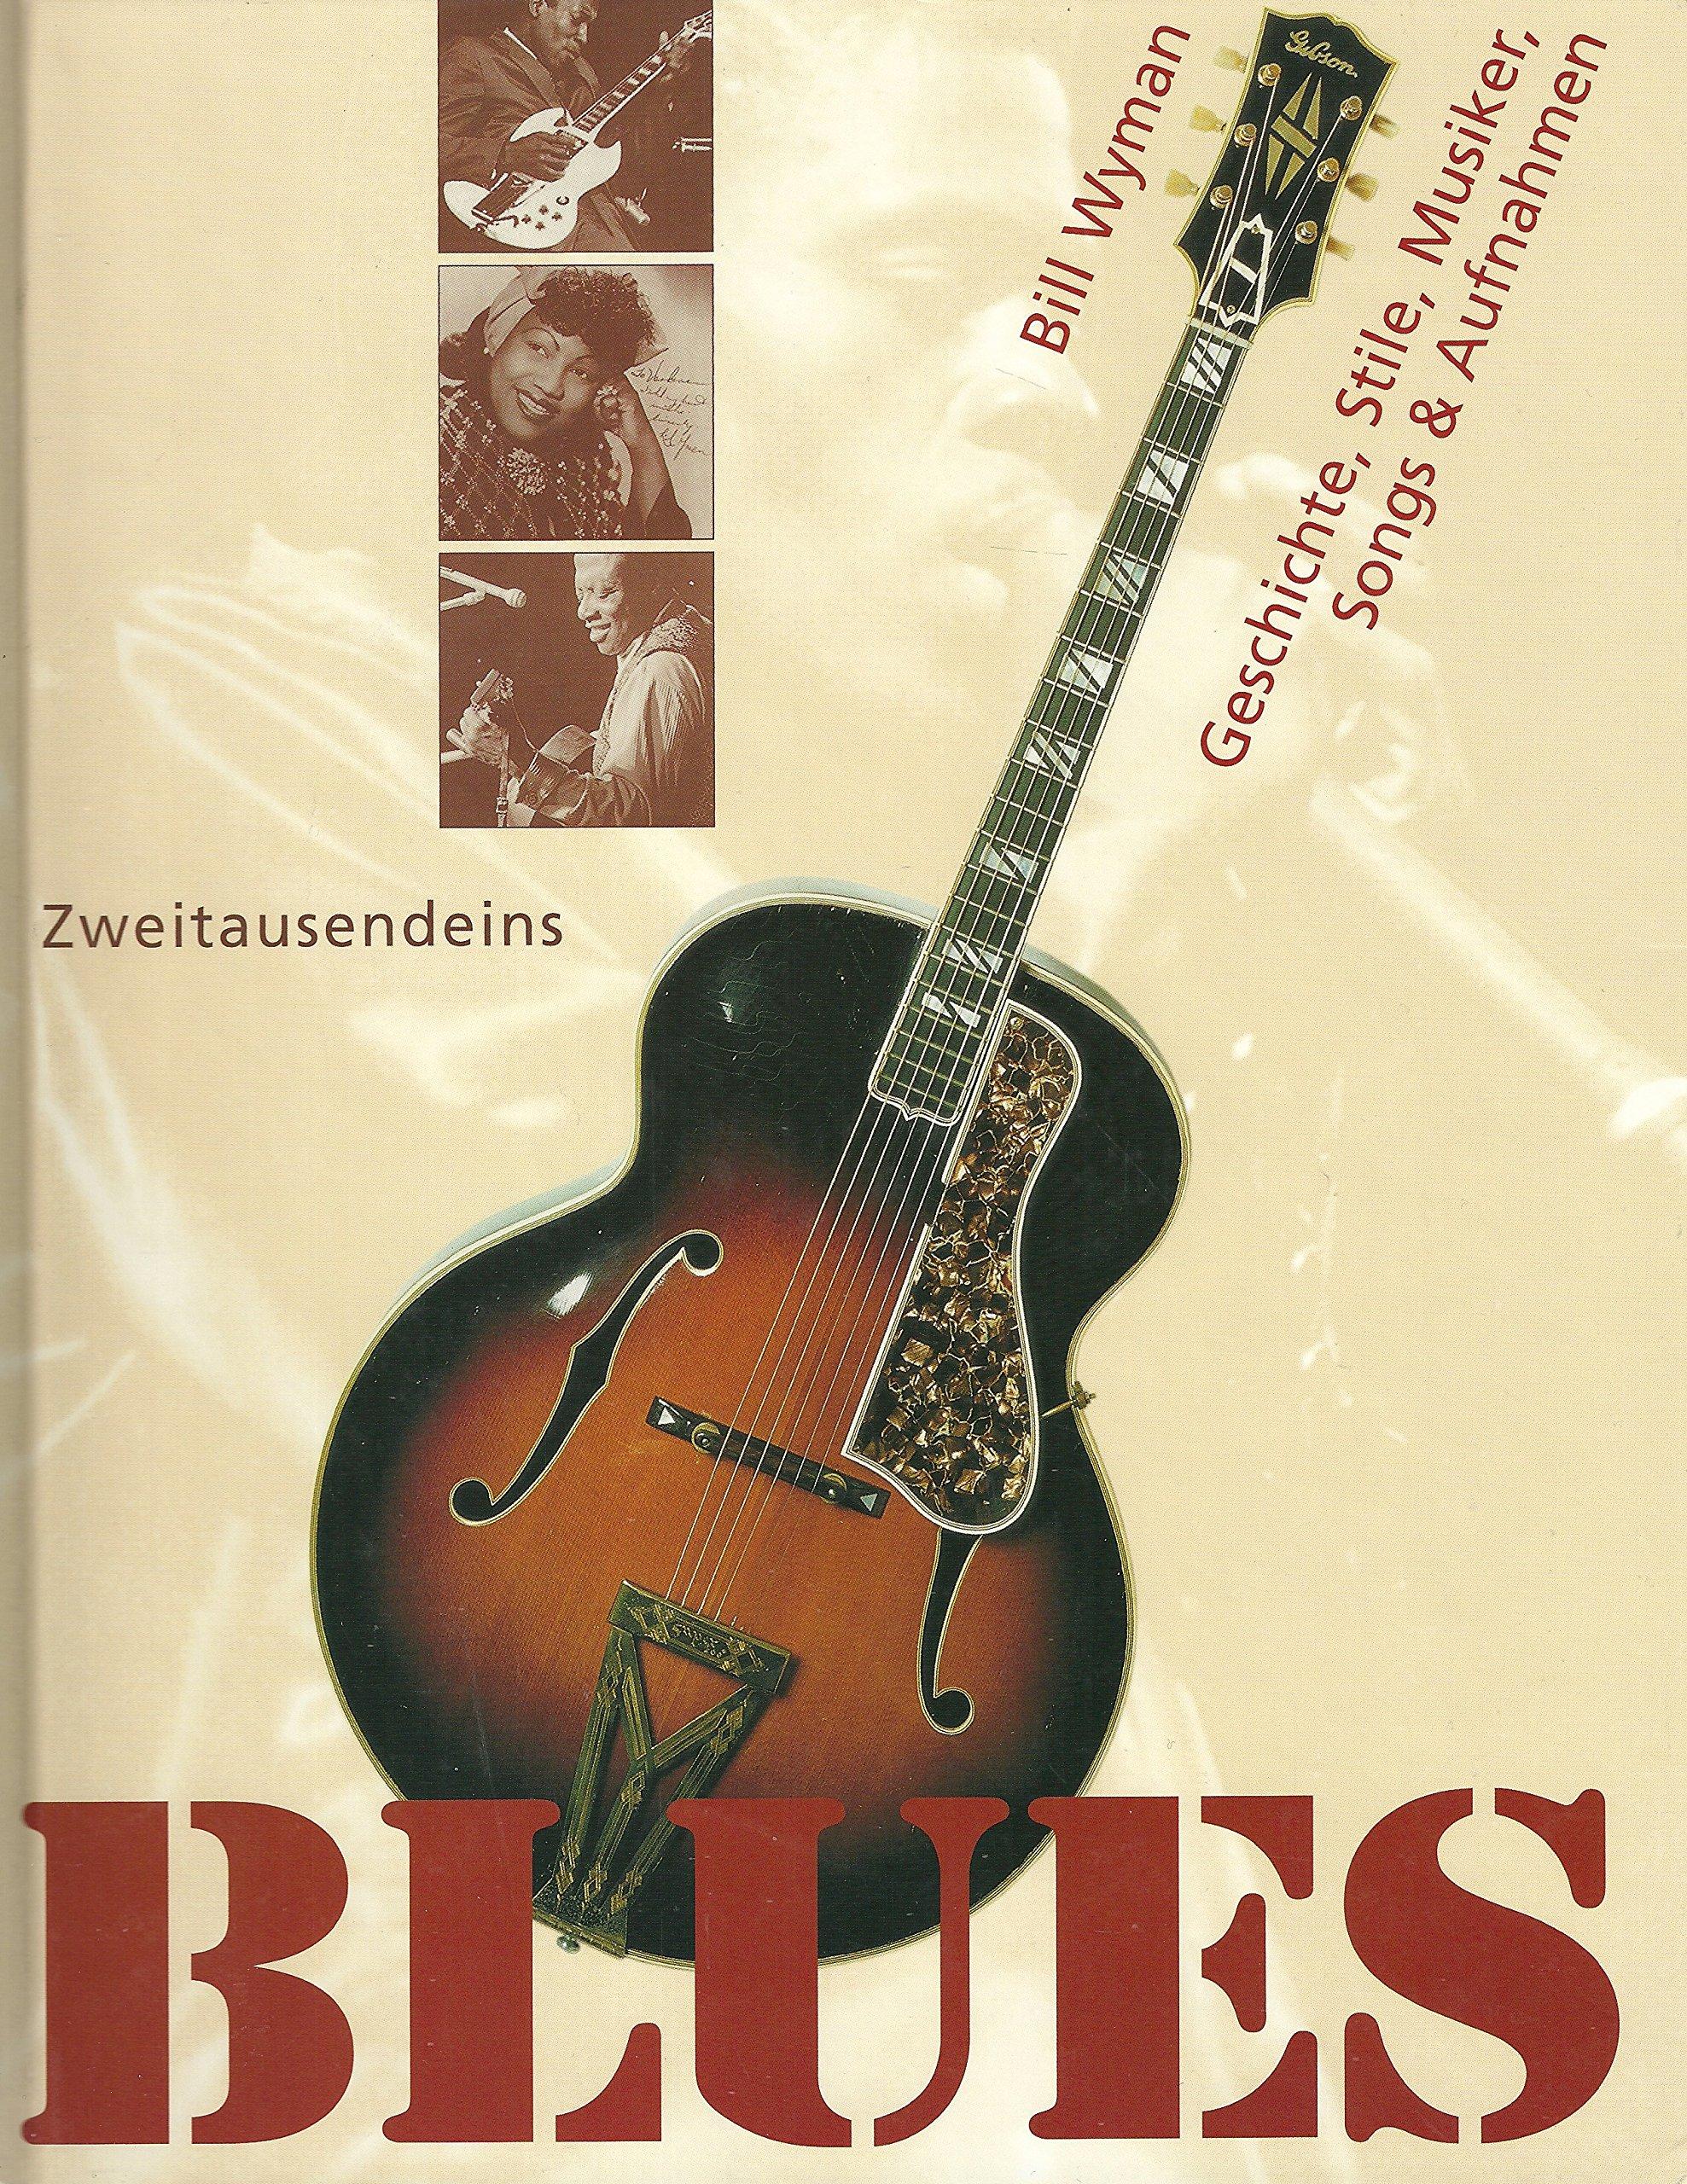 Blues: Geschichte, Stile, Musiker, Songs & Aufnahmen